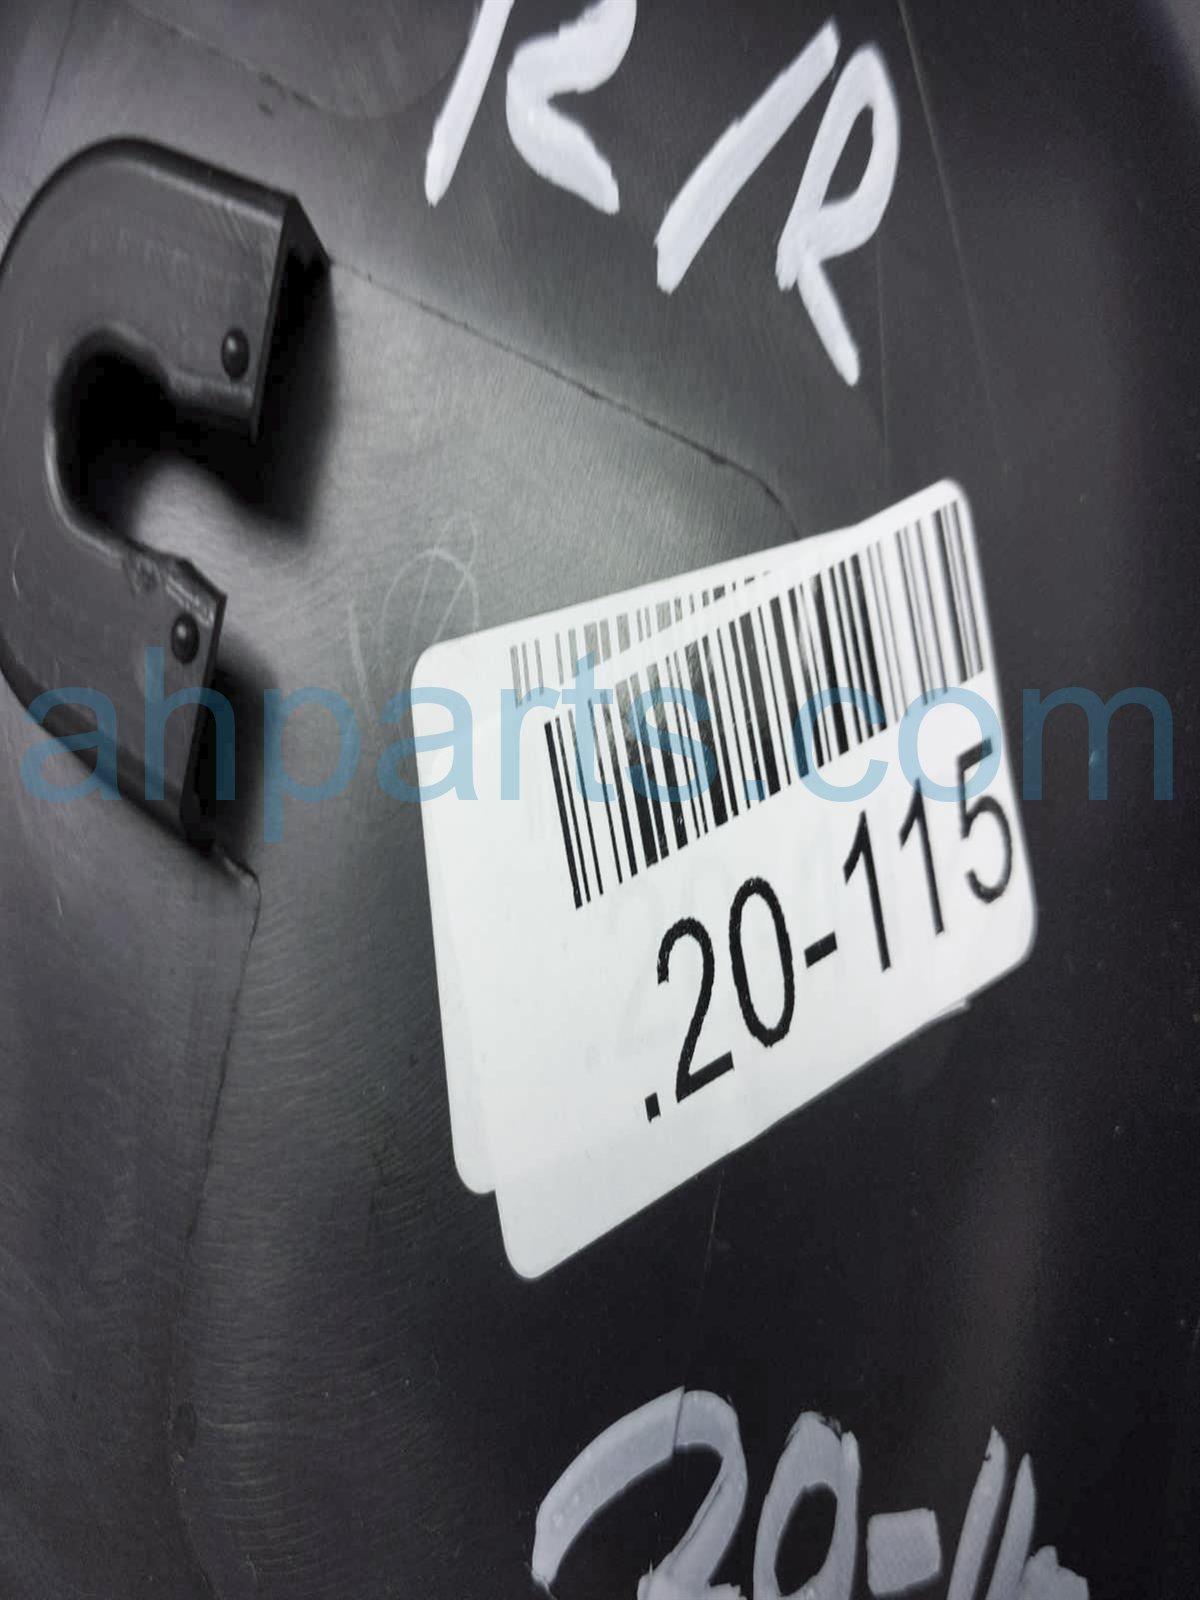 2019 Honda Passport Trim / Liner Rear Passenger Interior Door Panel   Black 83701 TGS A61ZA Replacement